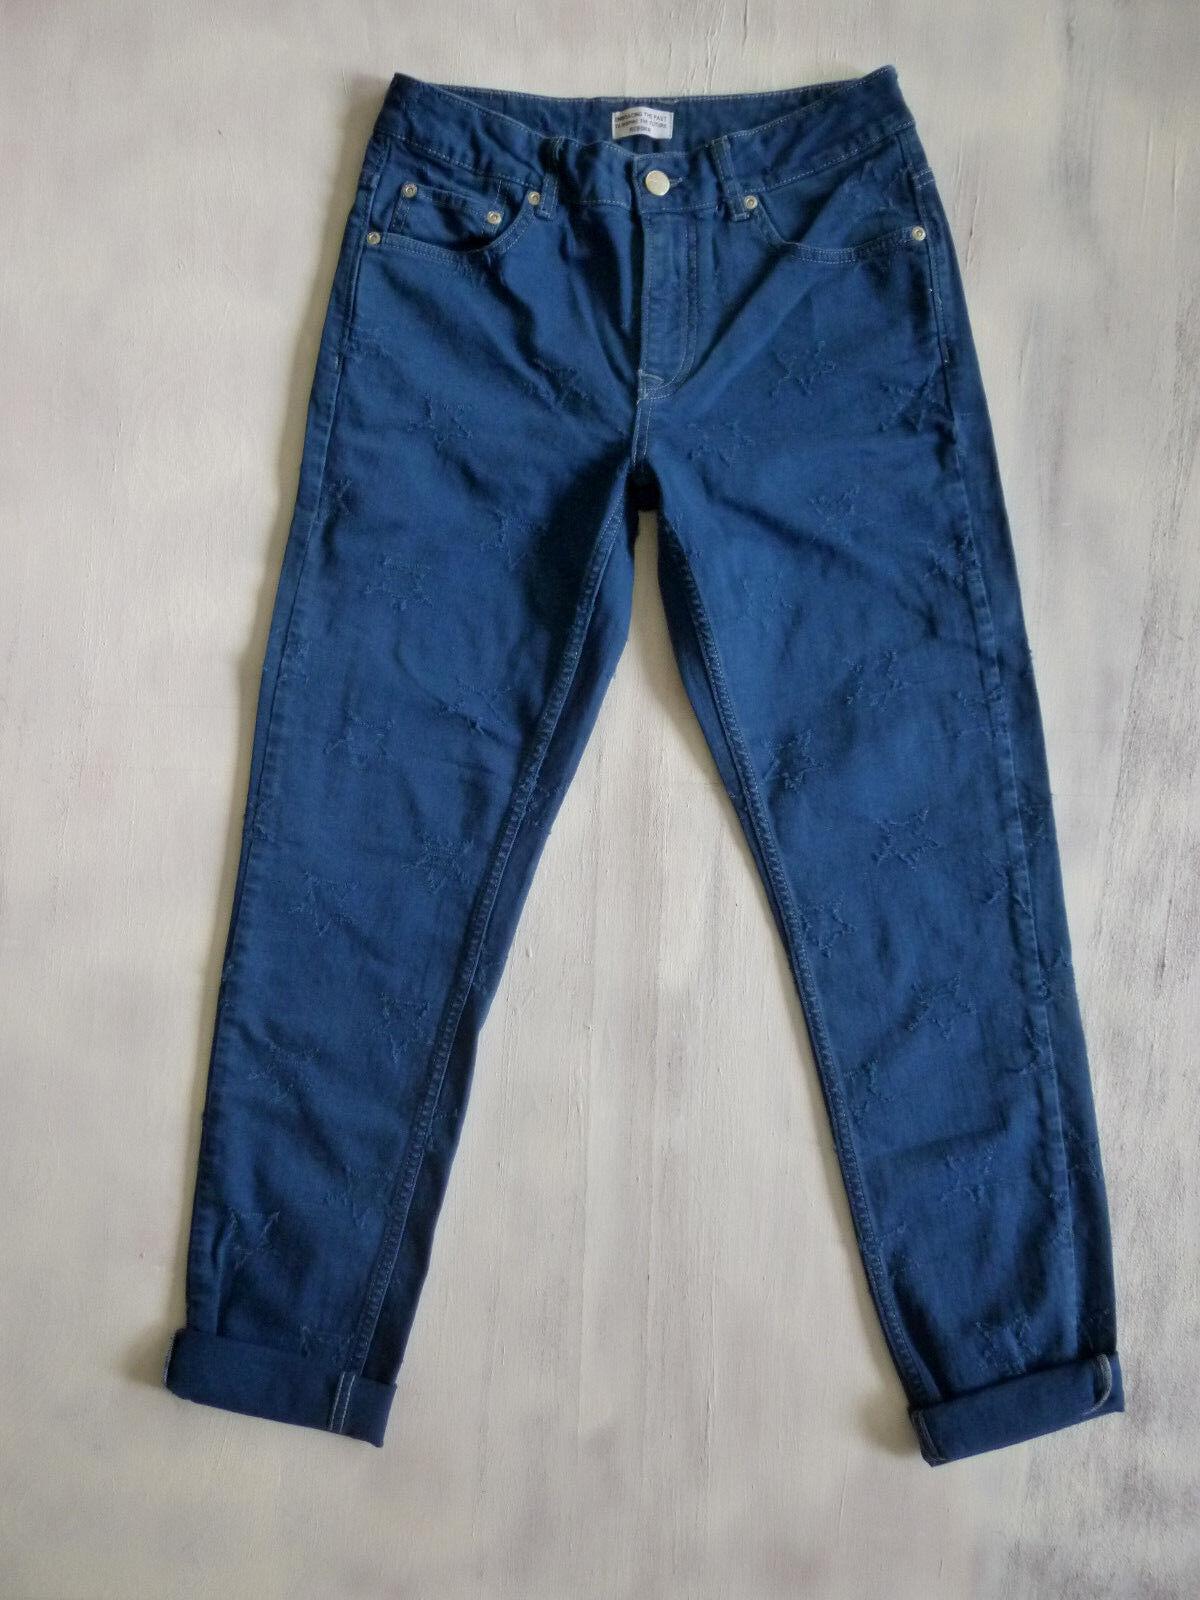 Pepe London REBORN Rosie slim Taperot mid-waist Jeans Hose Gr 34-36 W27 L29 Neu